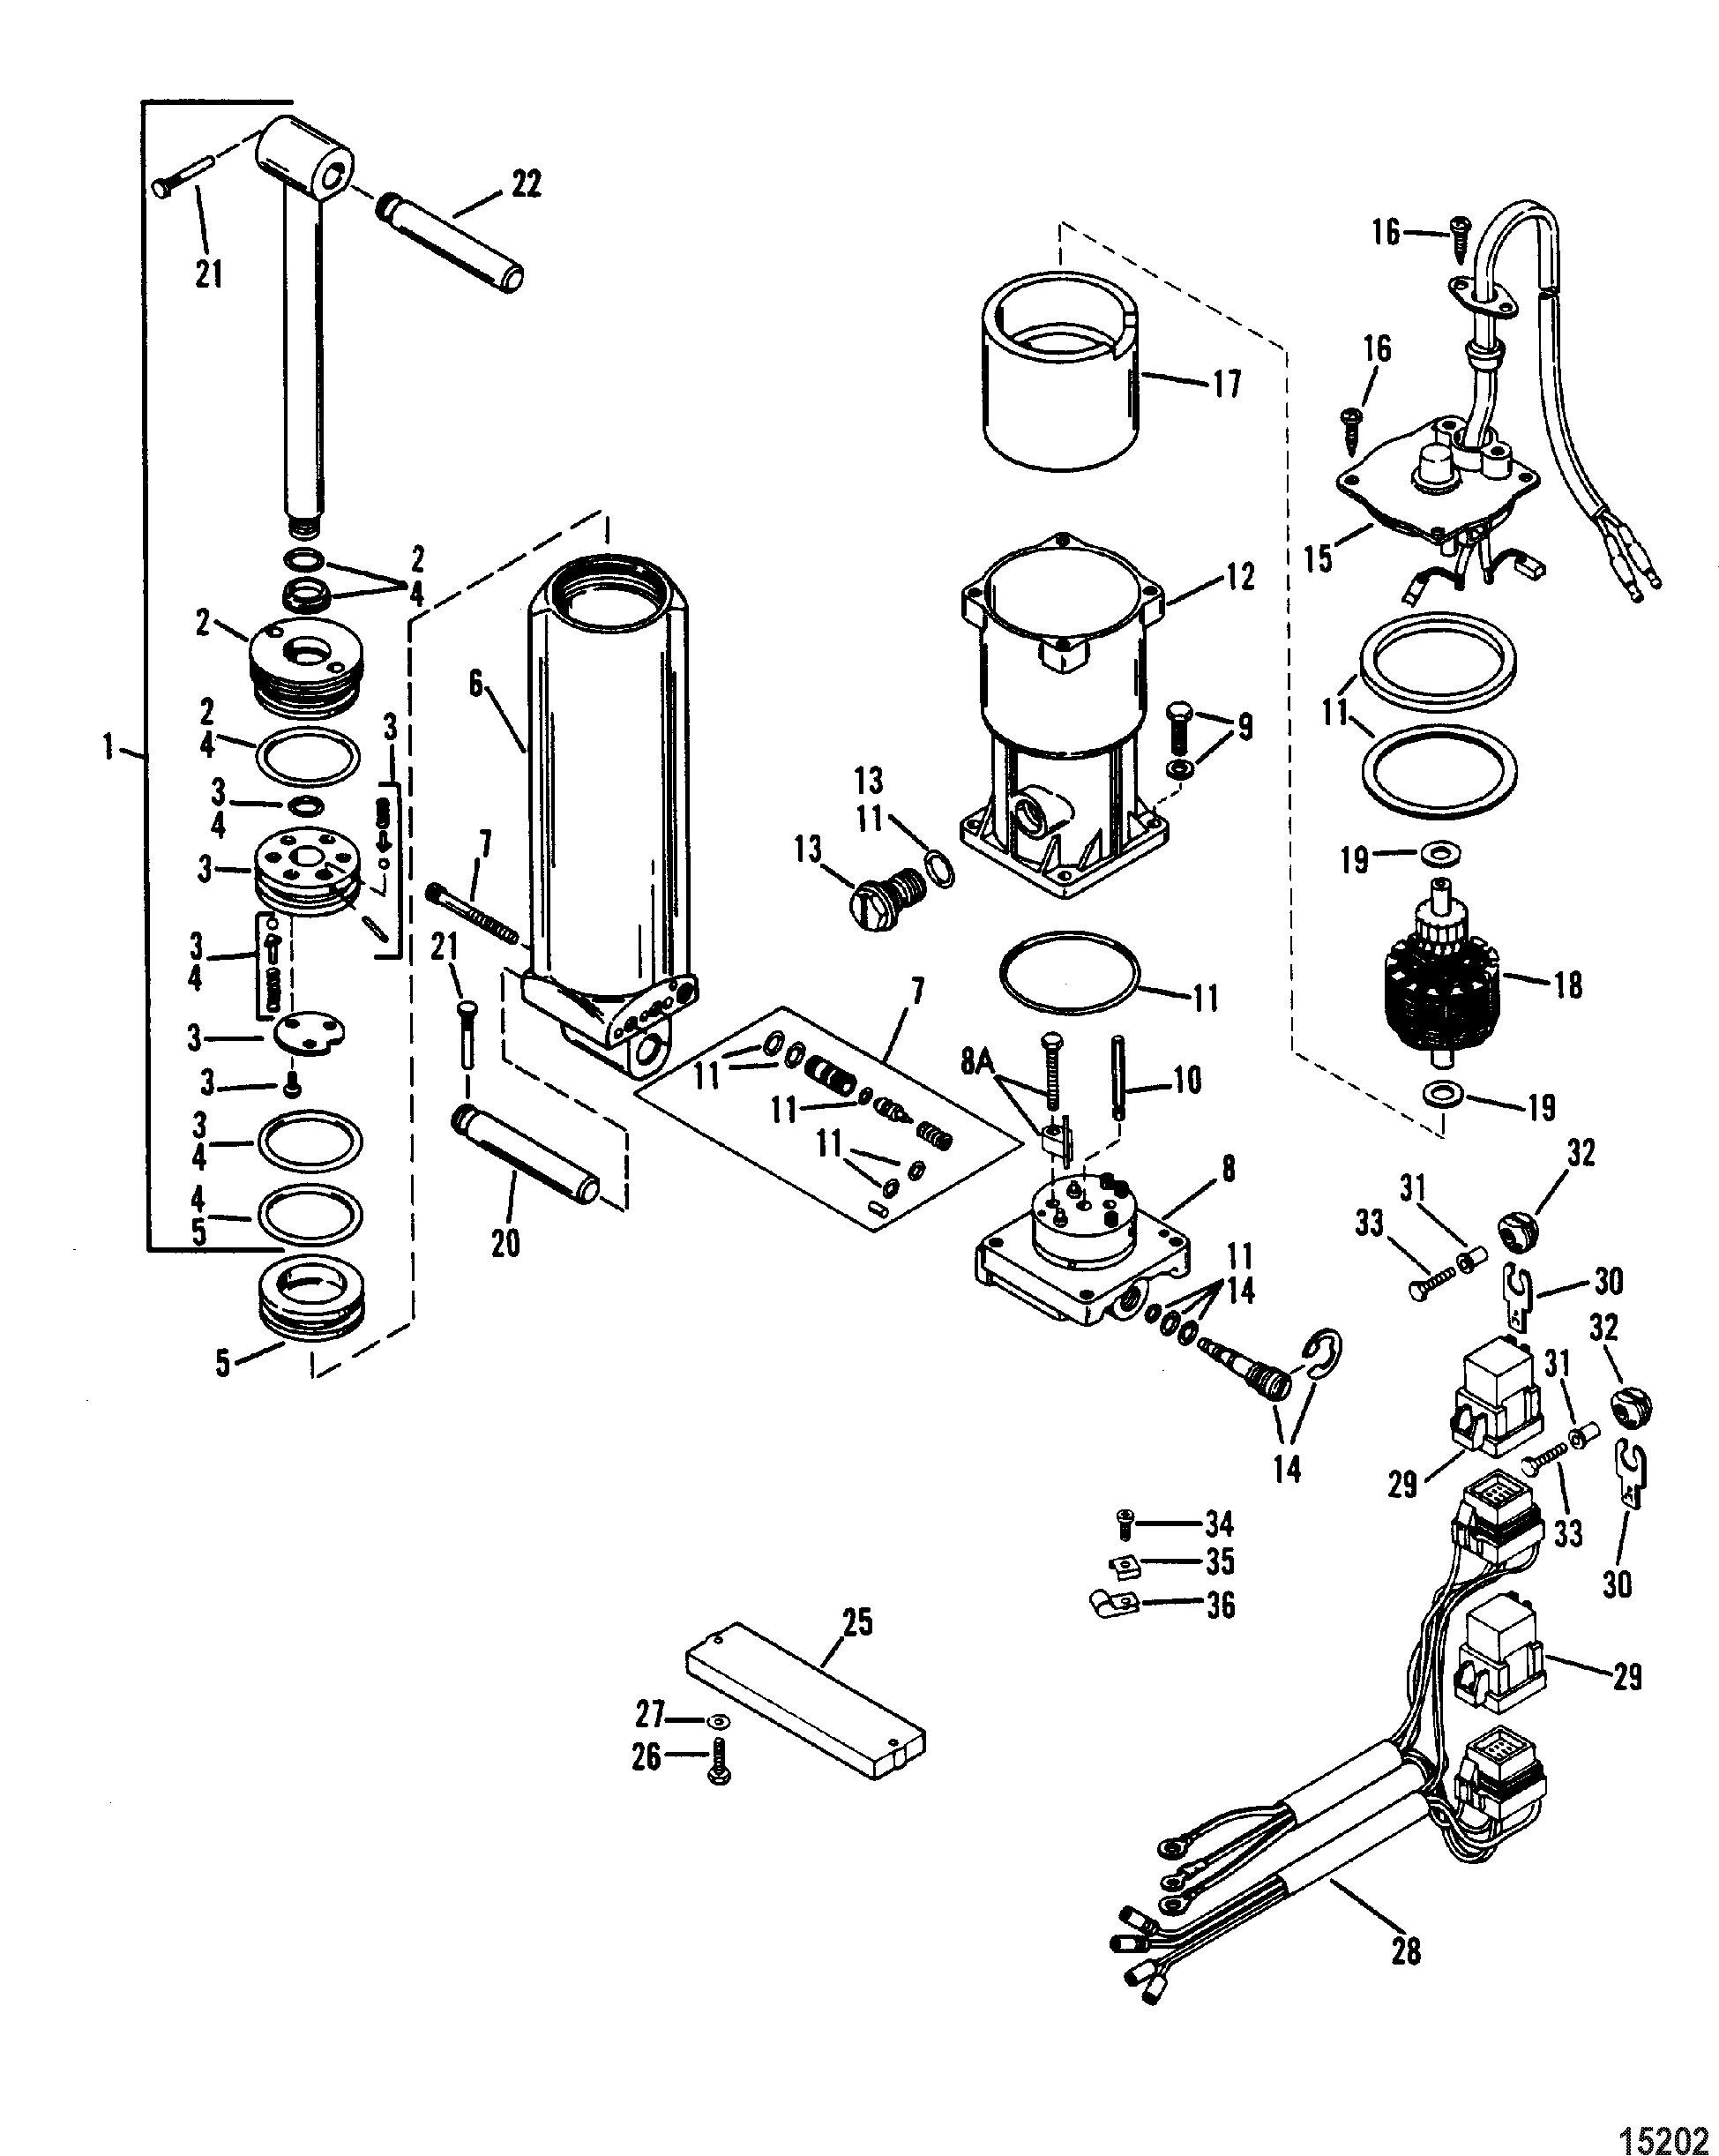 mercury 115 4 cyl auto electrical wiring diagram  power trim ponents single ram power trim for mariner mercury sea ray 100